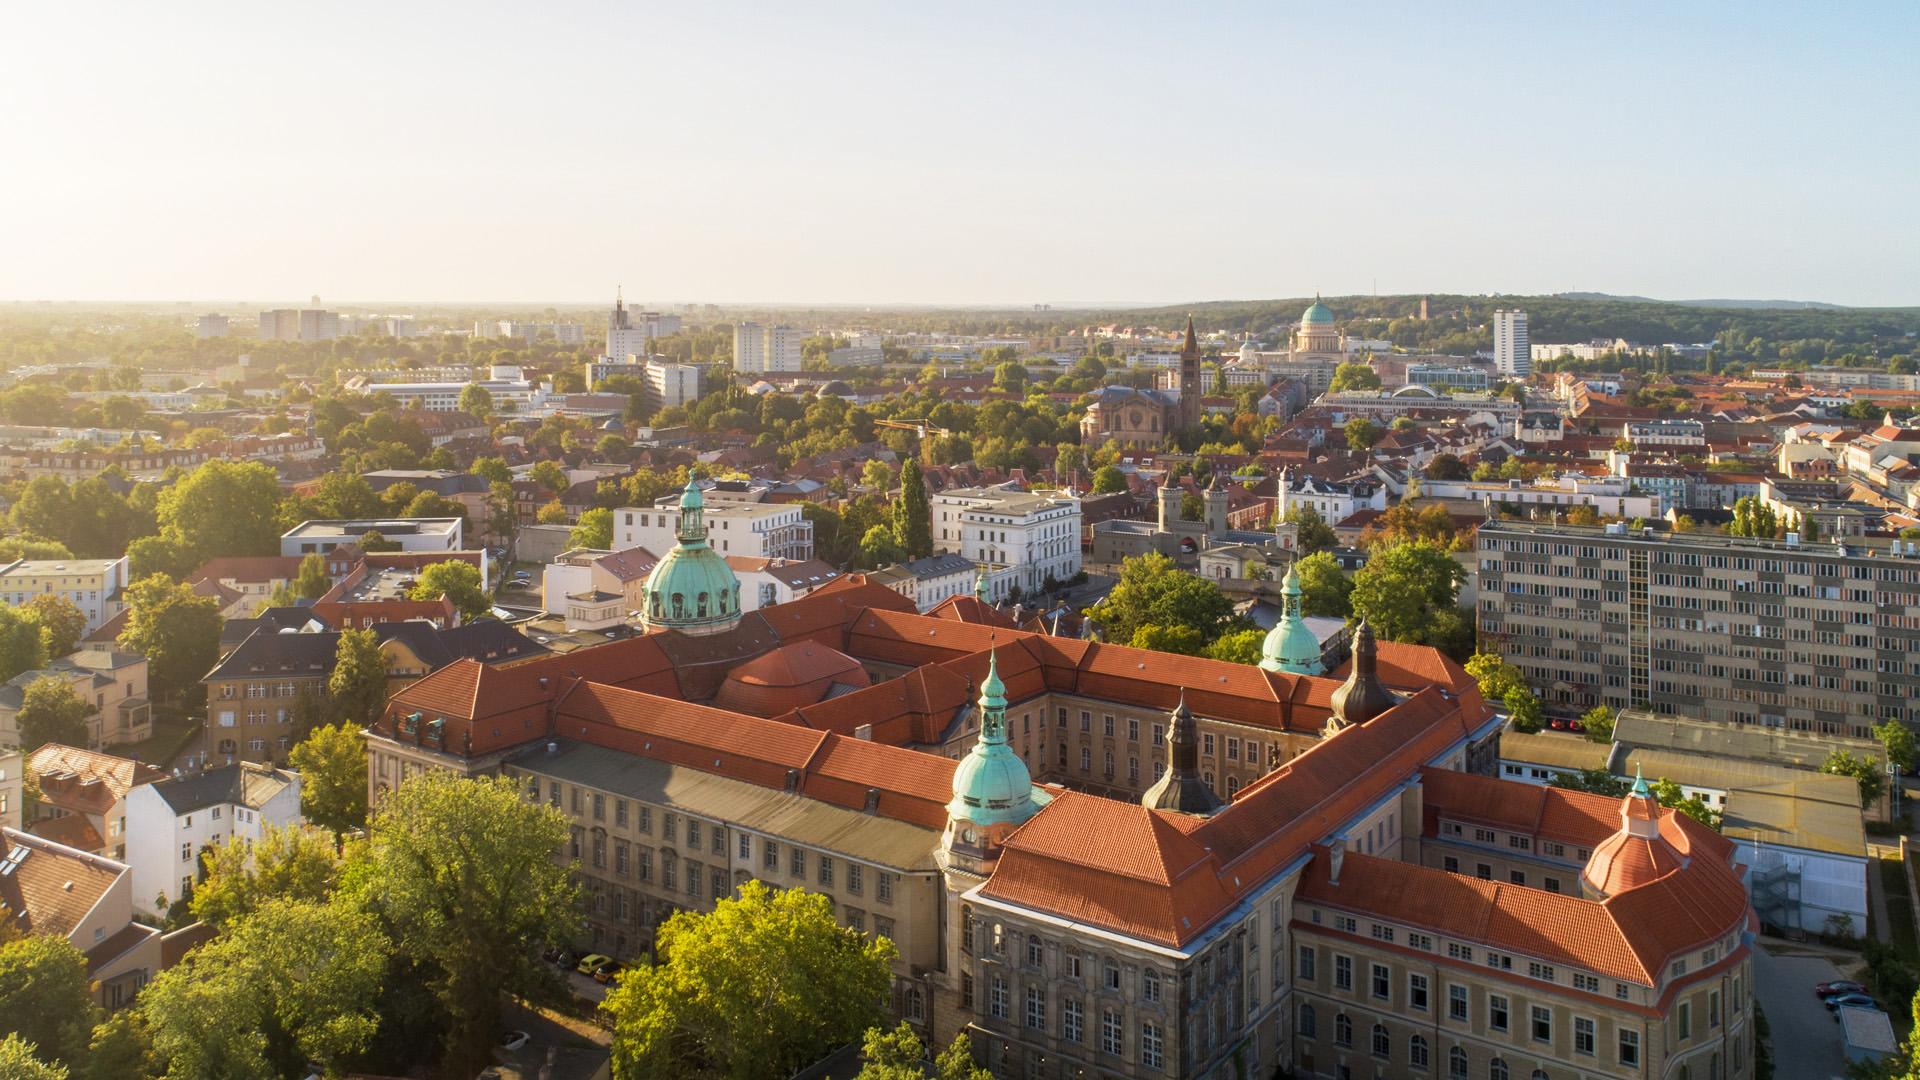 Fotokurs Fotografie lernen in Potsdam Foto Workshops